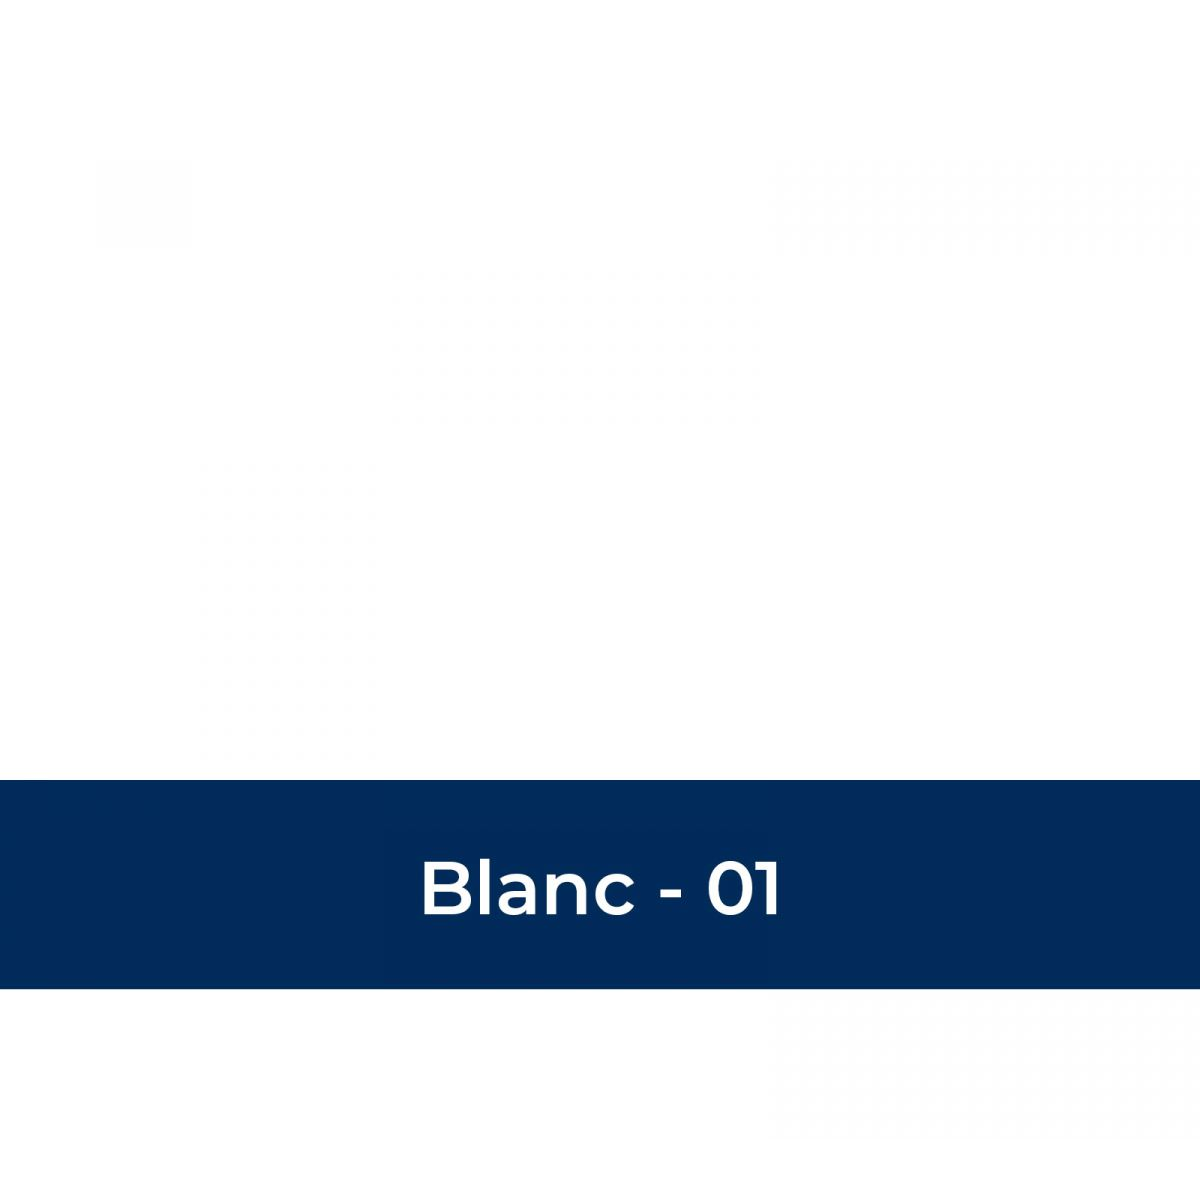 Flexcut Maxx blanc 01